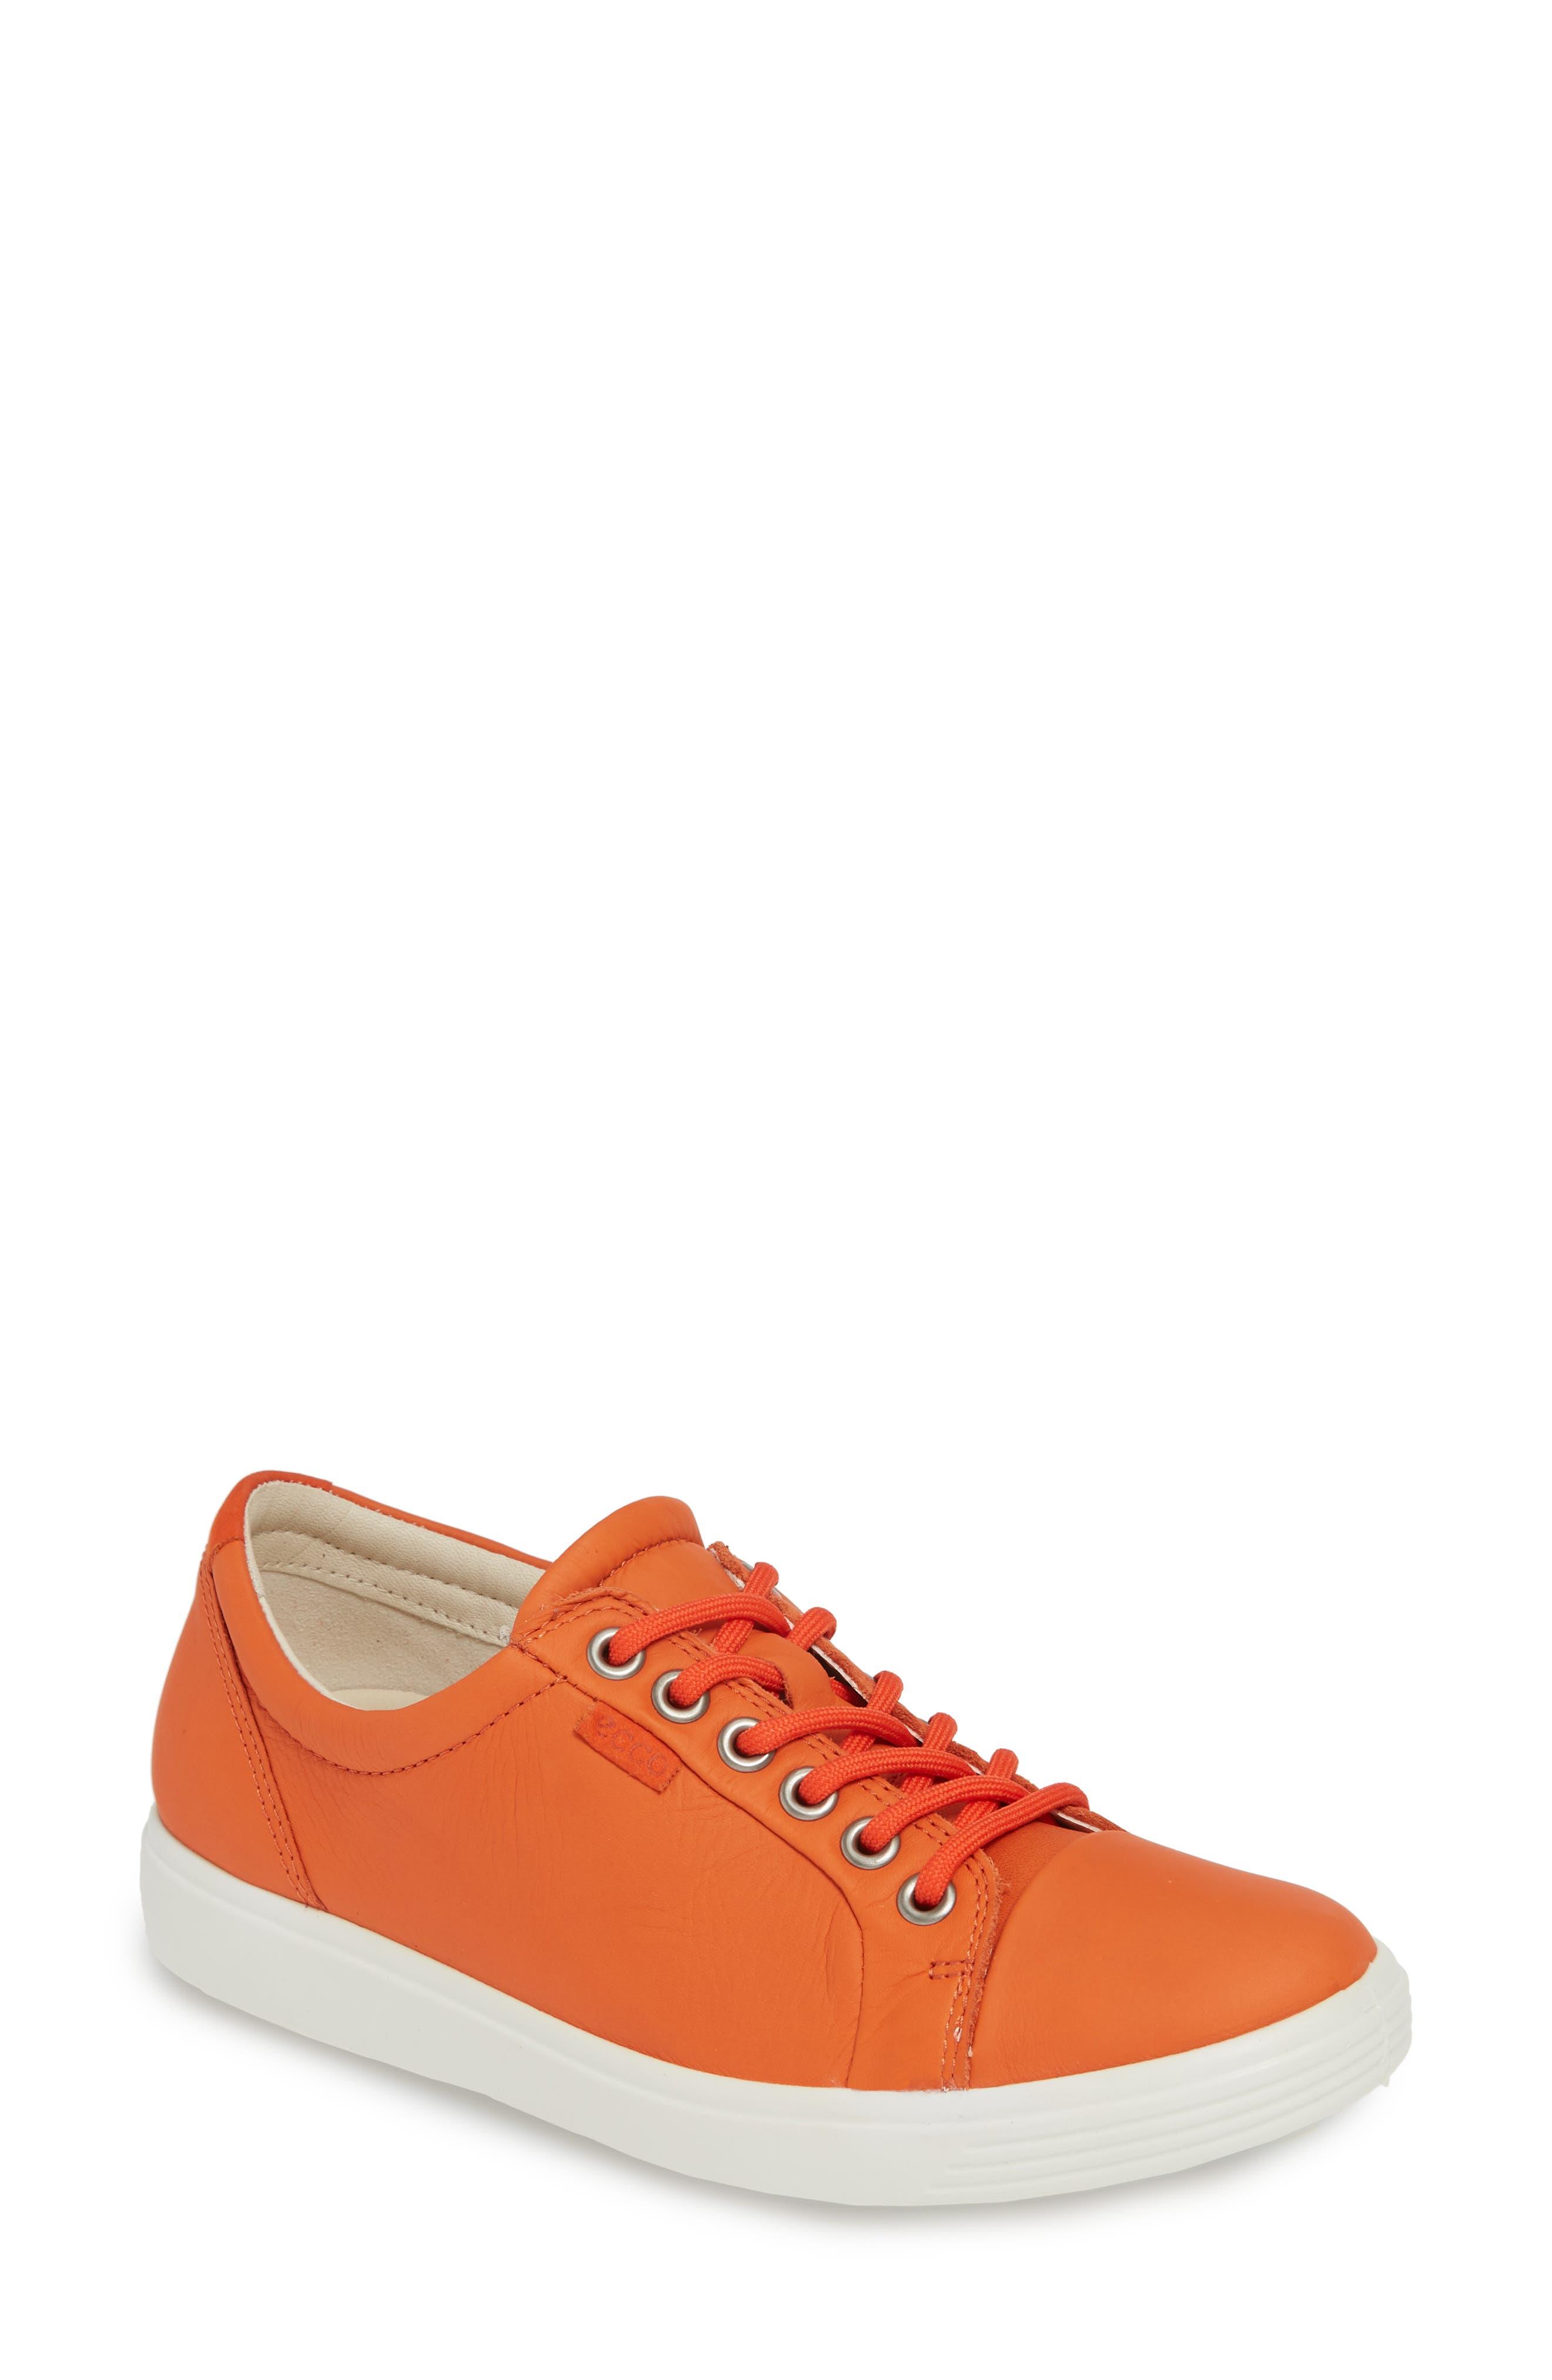 ,                             Soft 7 Sneaker,                             Main thumbnail 173, color,                             800